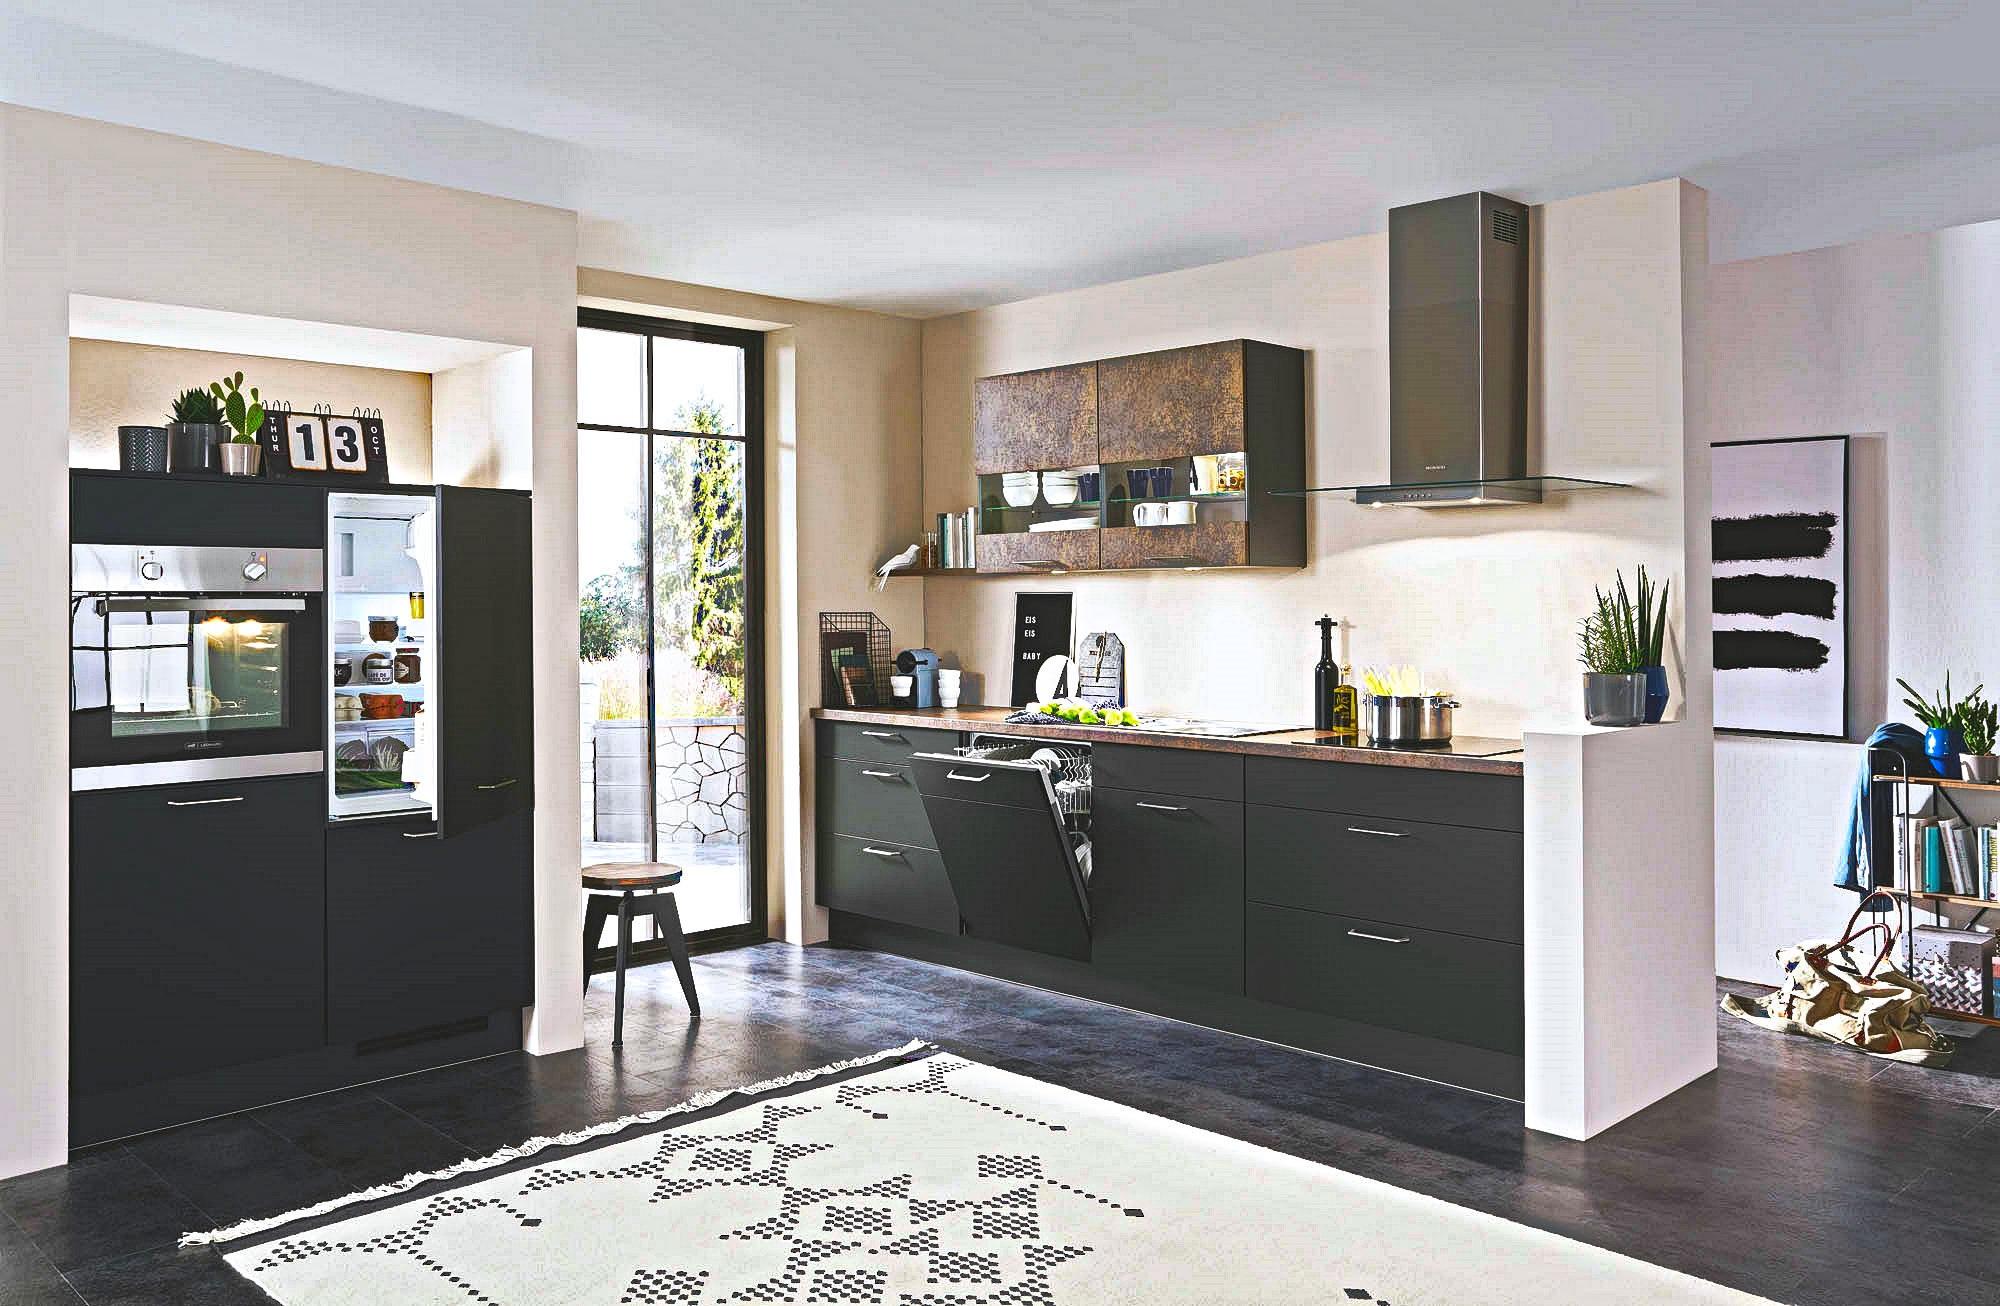 Full Size of Schwarze Küche Pro Contra Fliesen Für Schwarze Küche Schwarze Küche Roller Schwarze Küche Graue Wand Küche Schwarze Küche